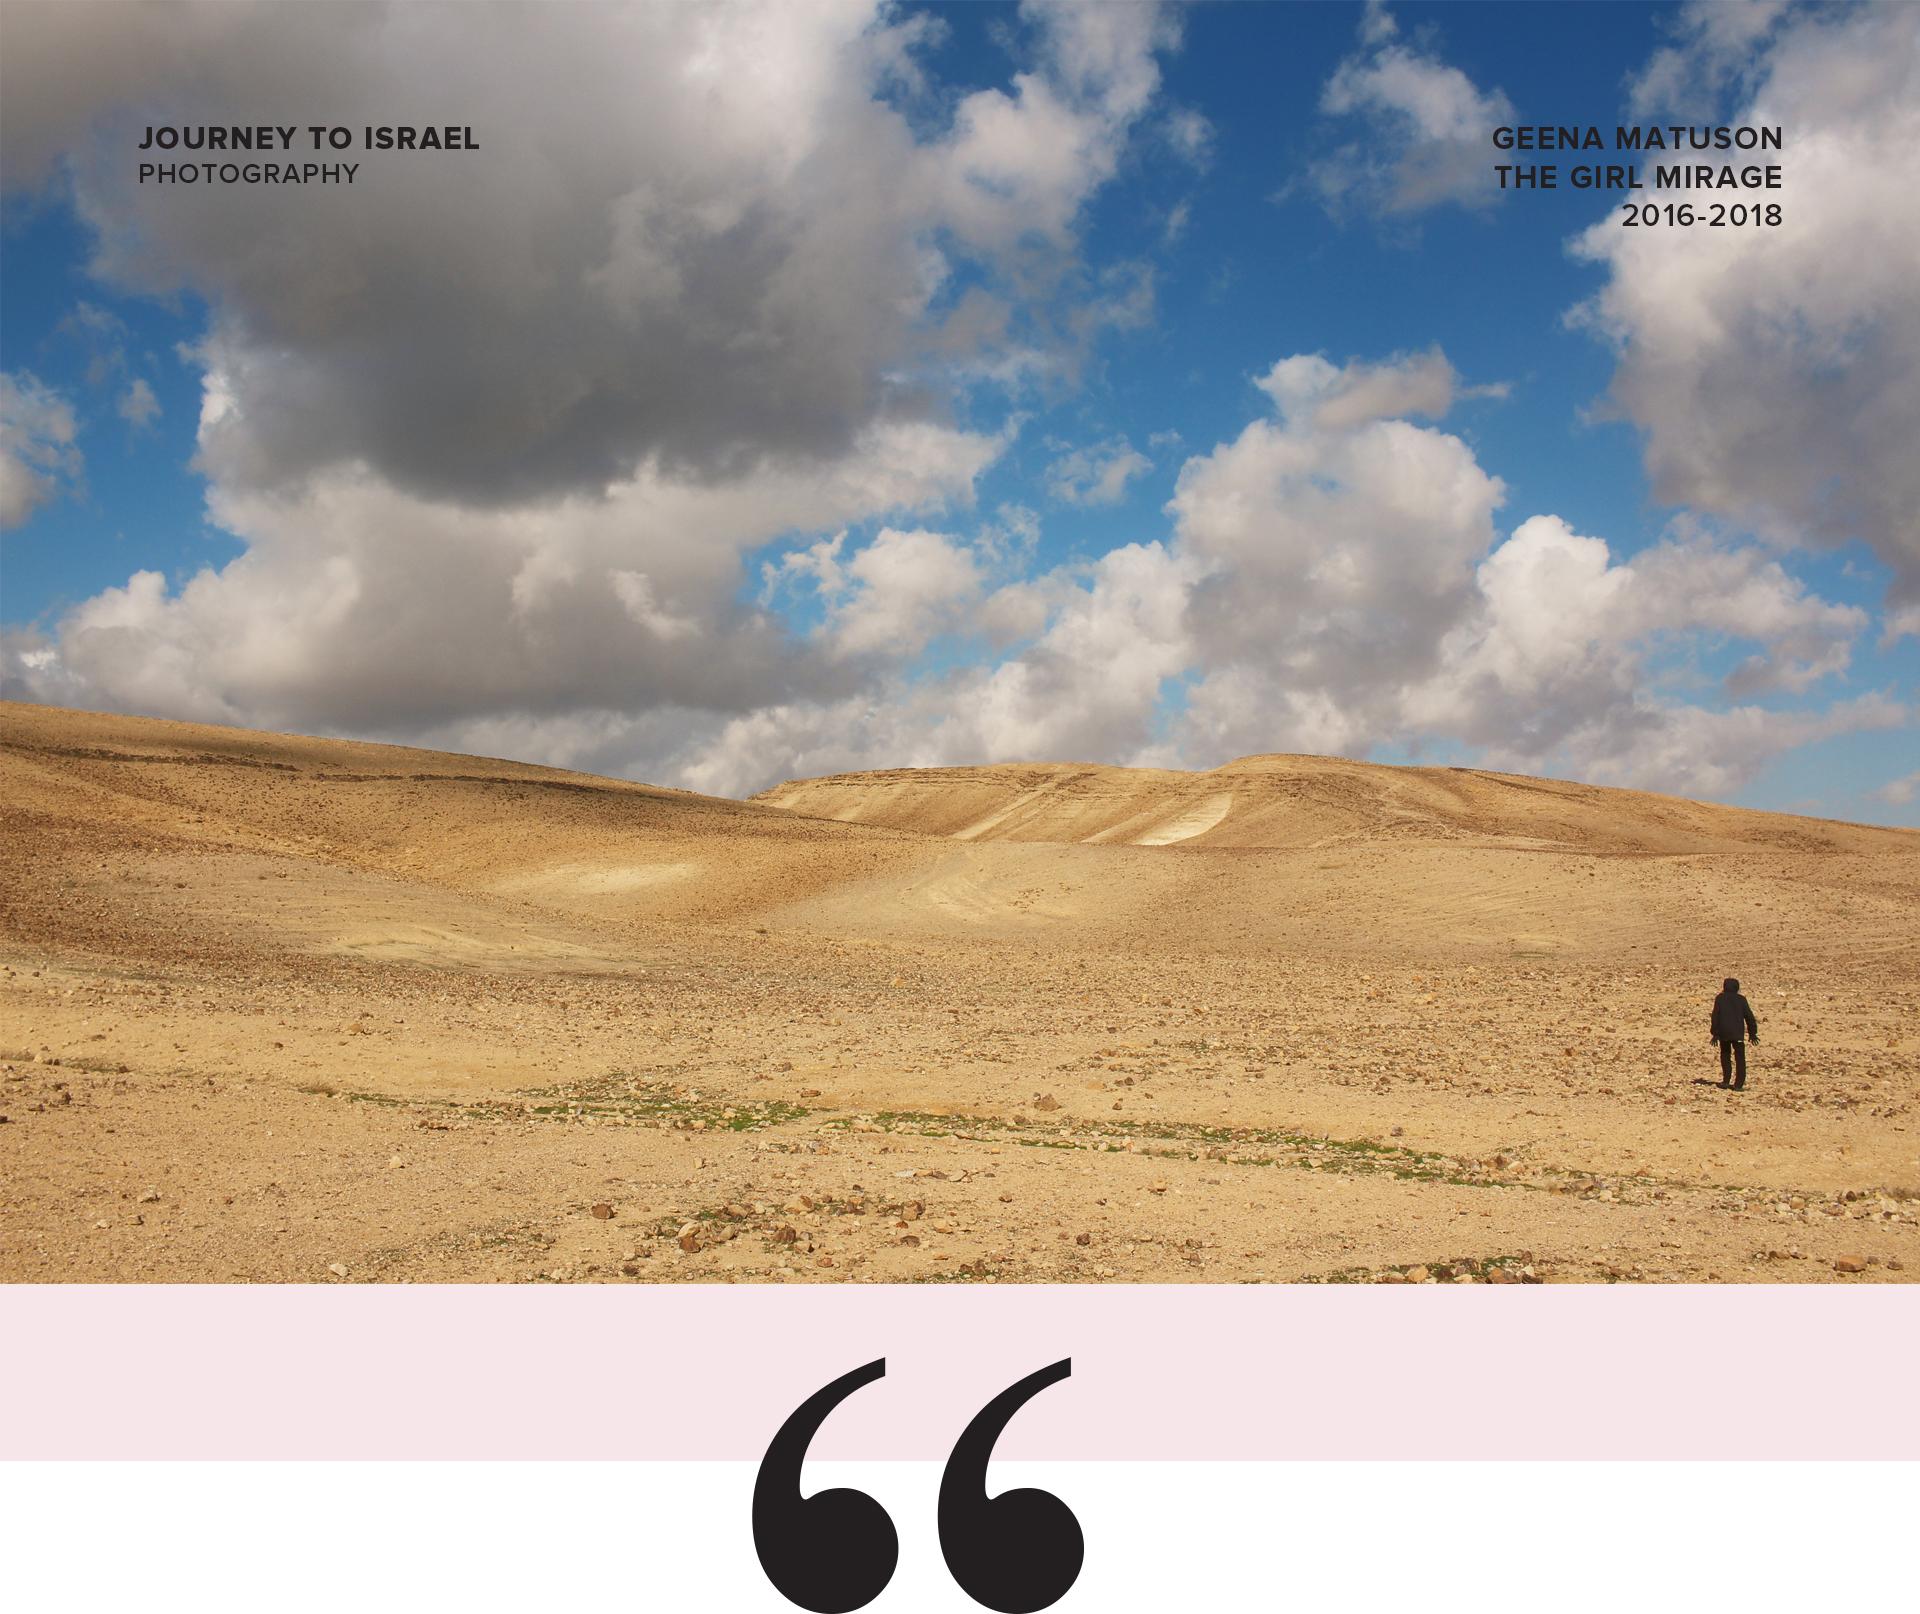 Israel's Negev Desert in Winter / Travel photography by Geena Matuson @geenamatuson #thegirlmirage